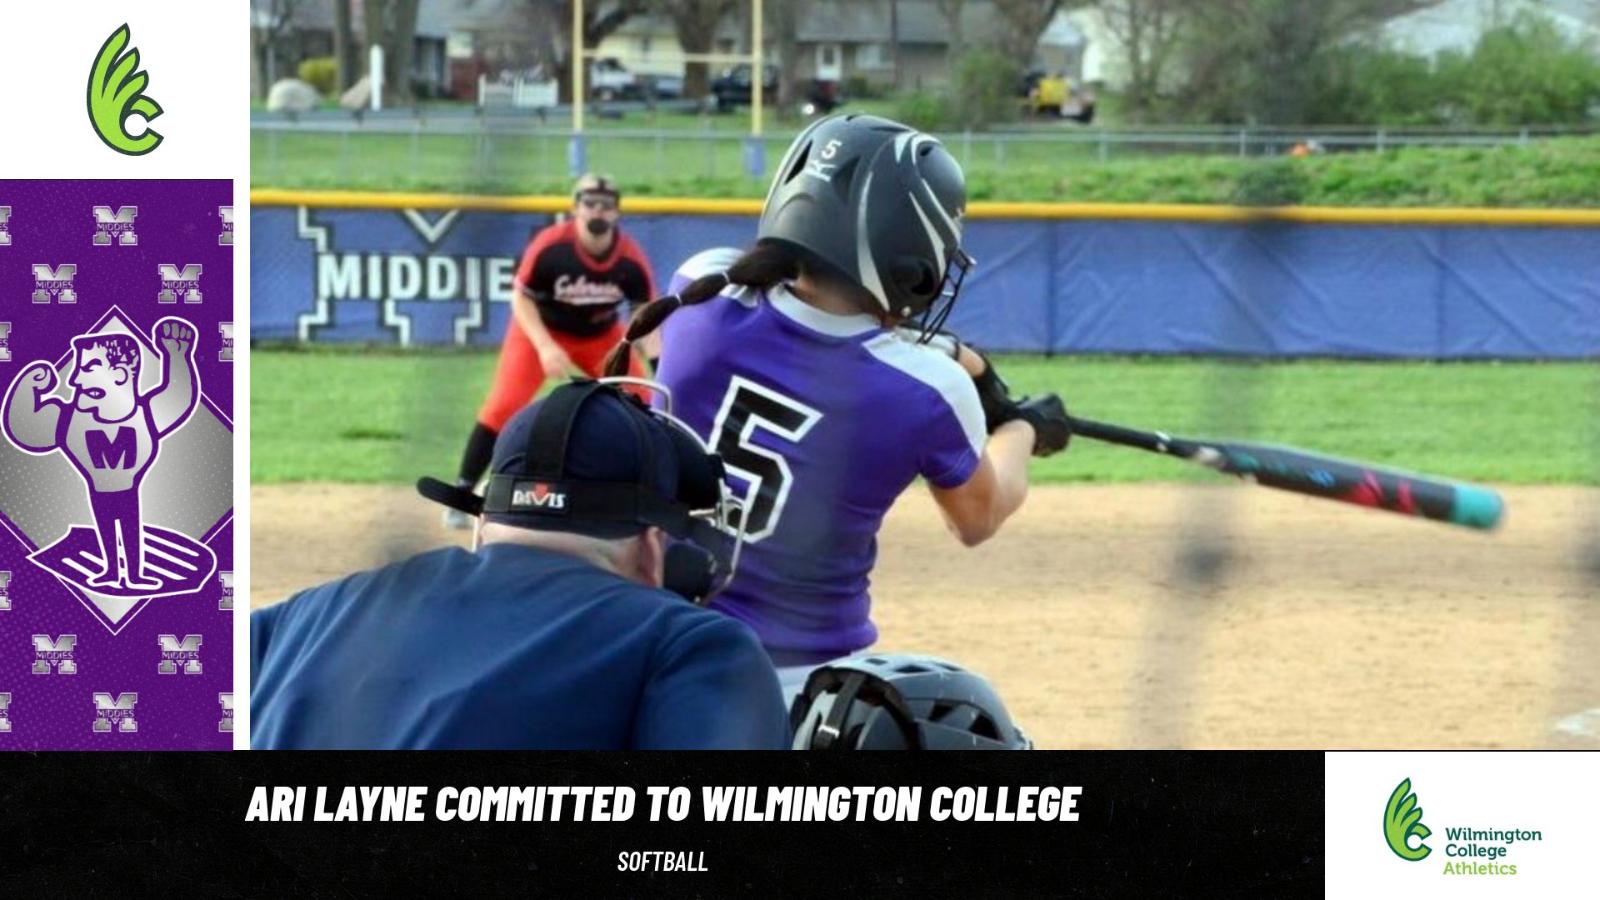 Ari Layne Commits To Wilmington College For Softball